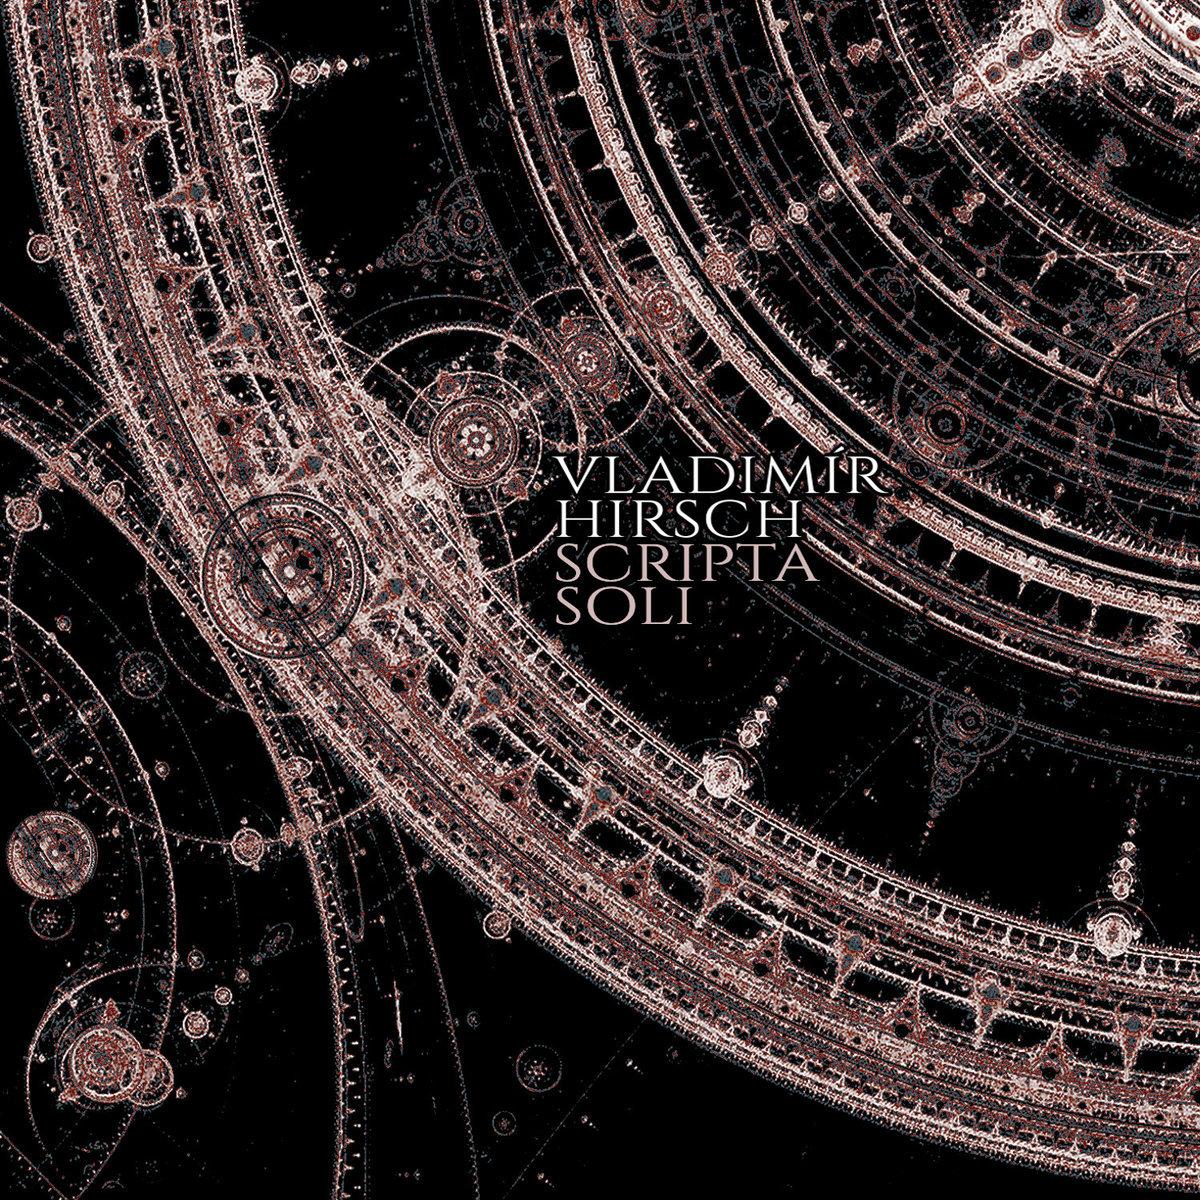 Vladimir Hirsch - Scripta Soli CD - 画像1